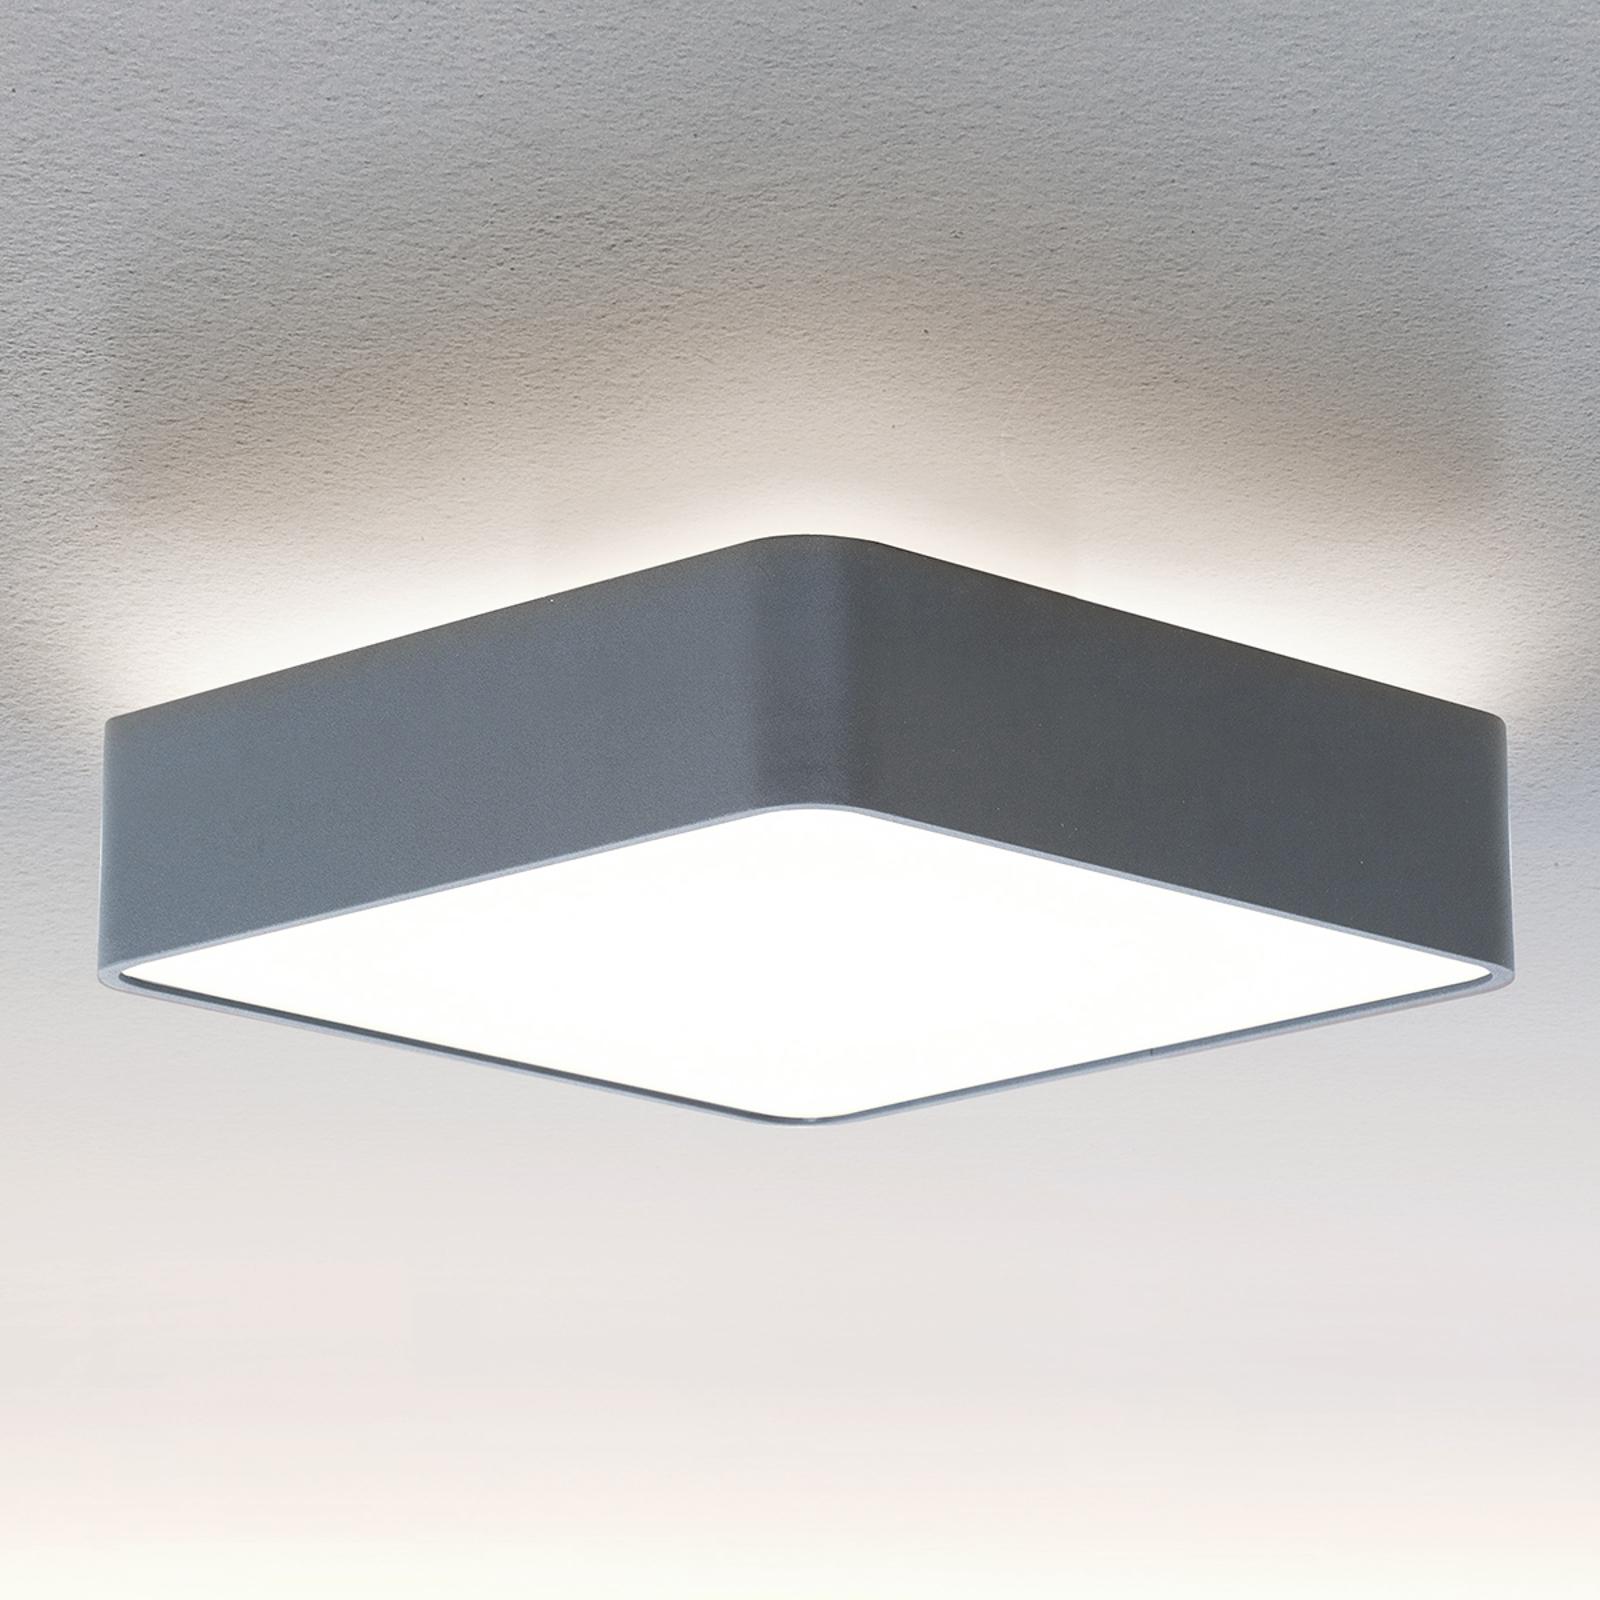 Kattovalaisin LED Caleo-X2 ww 41,4 cm